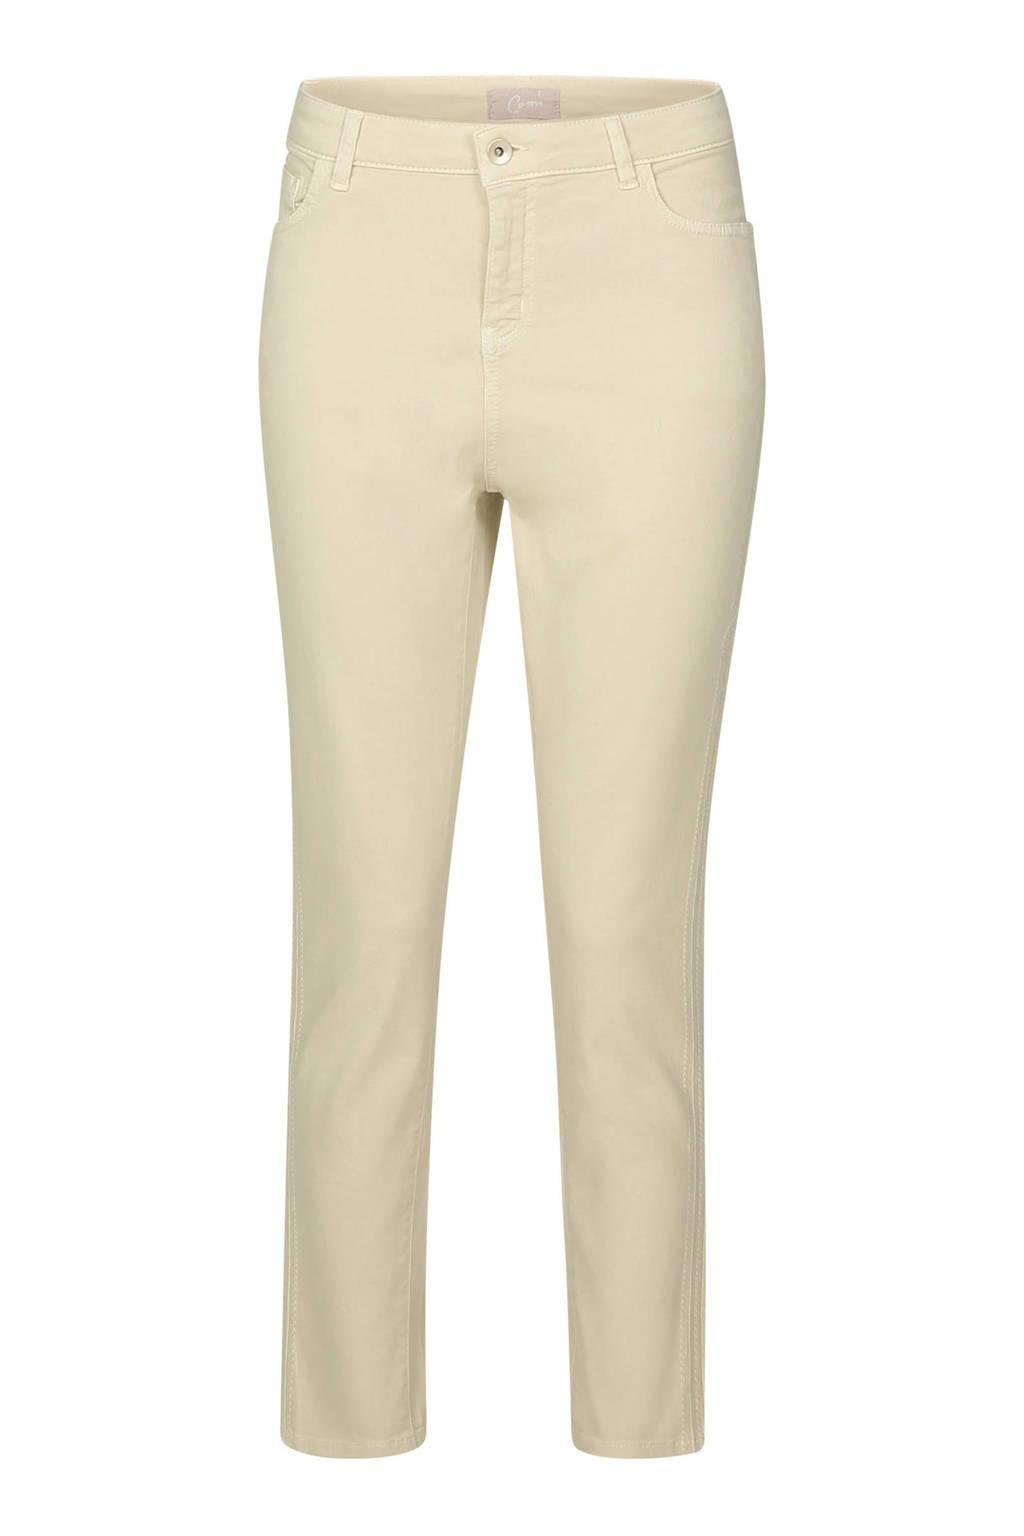 Cassis cropped slim fit broek met pailletten ecru, Ecru